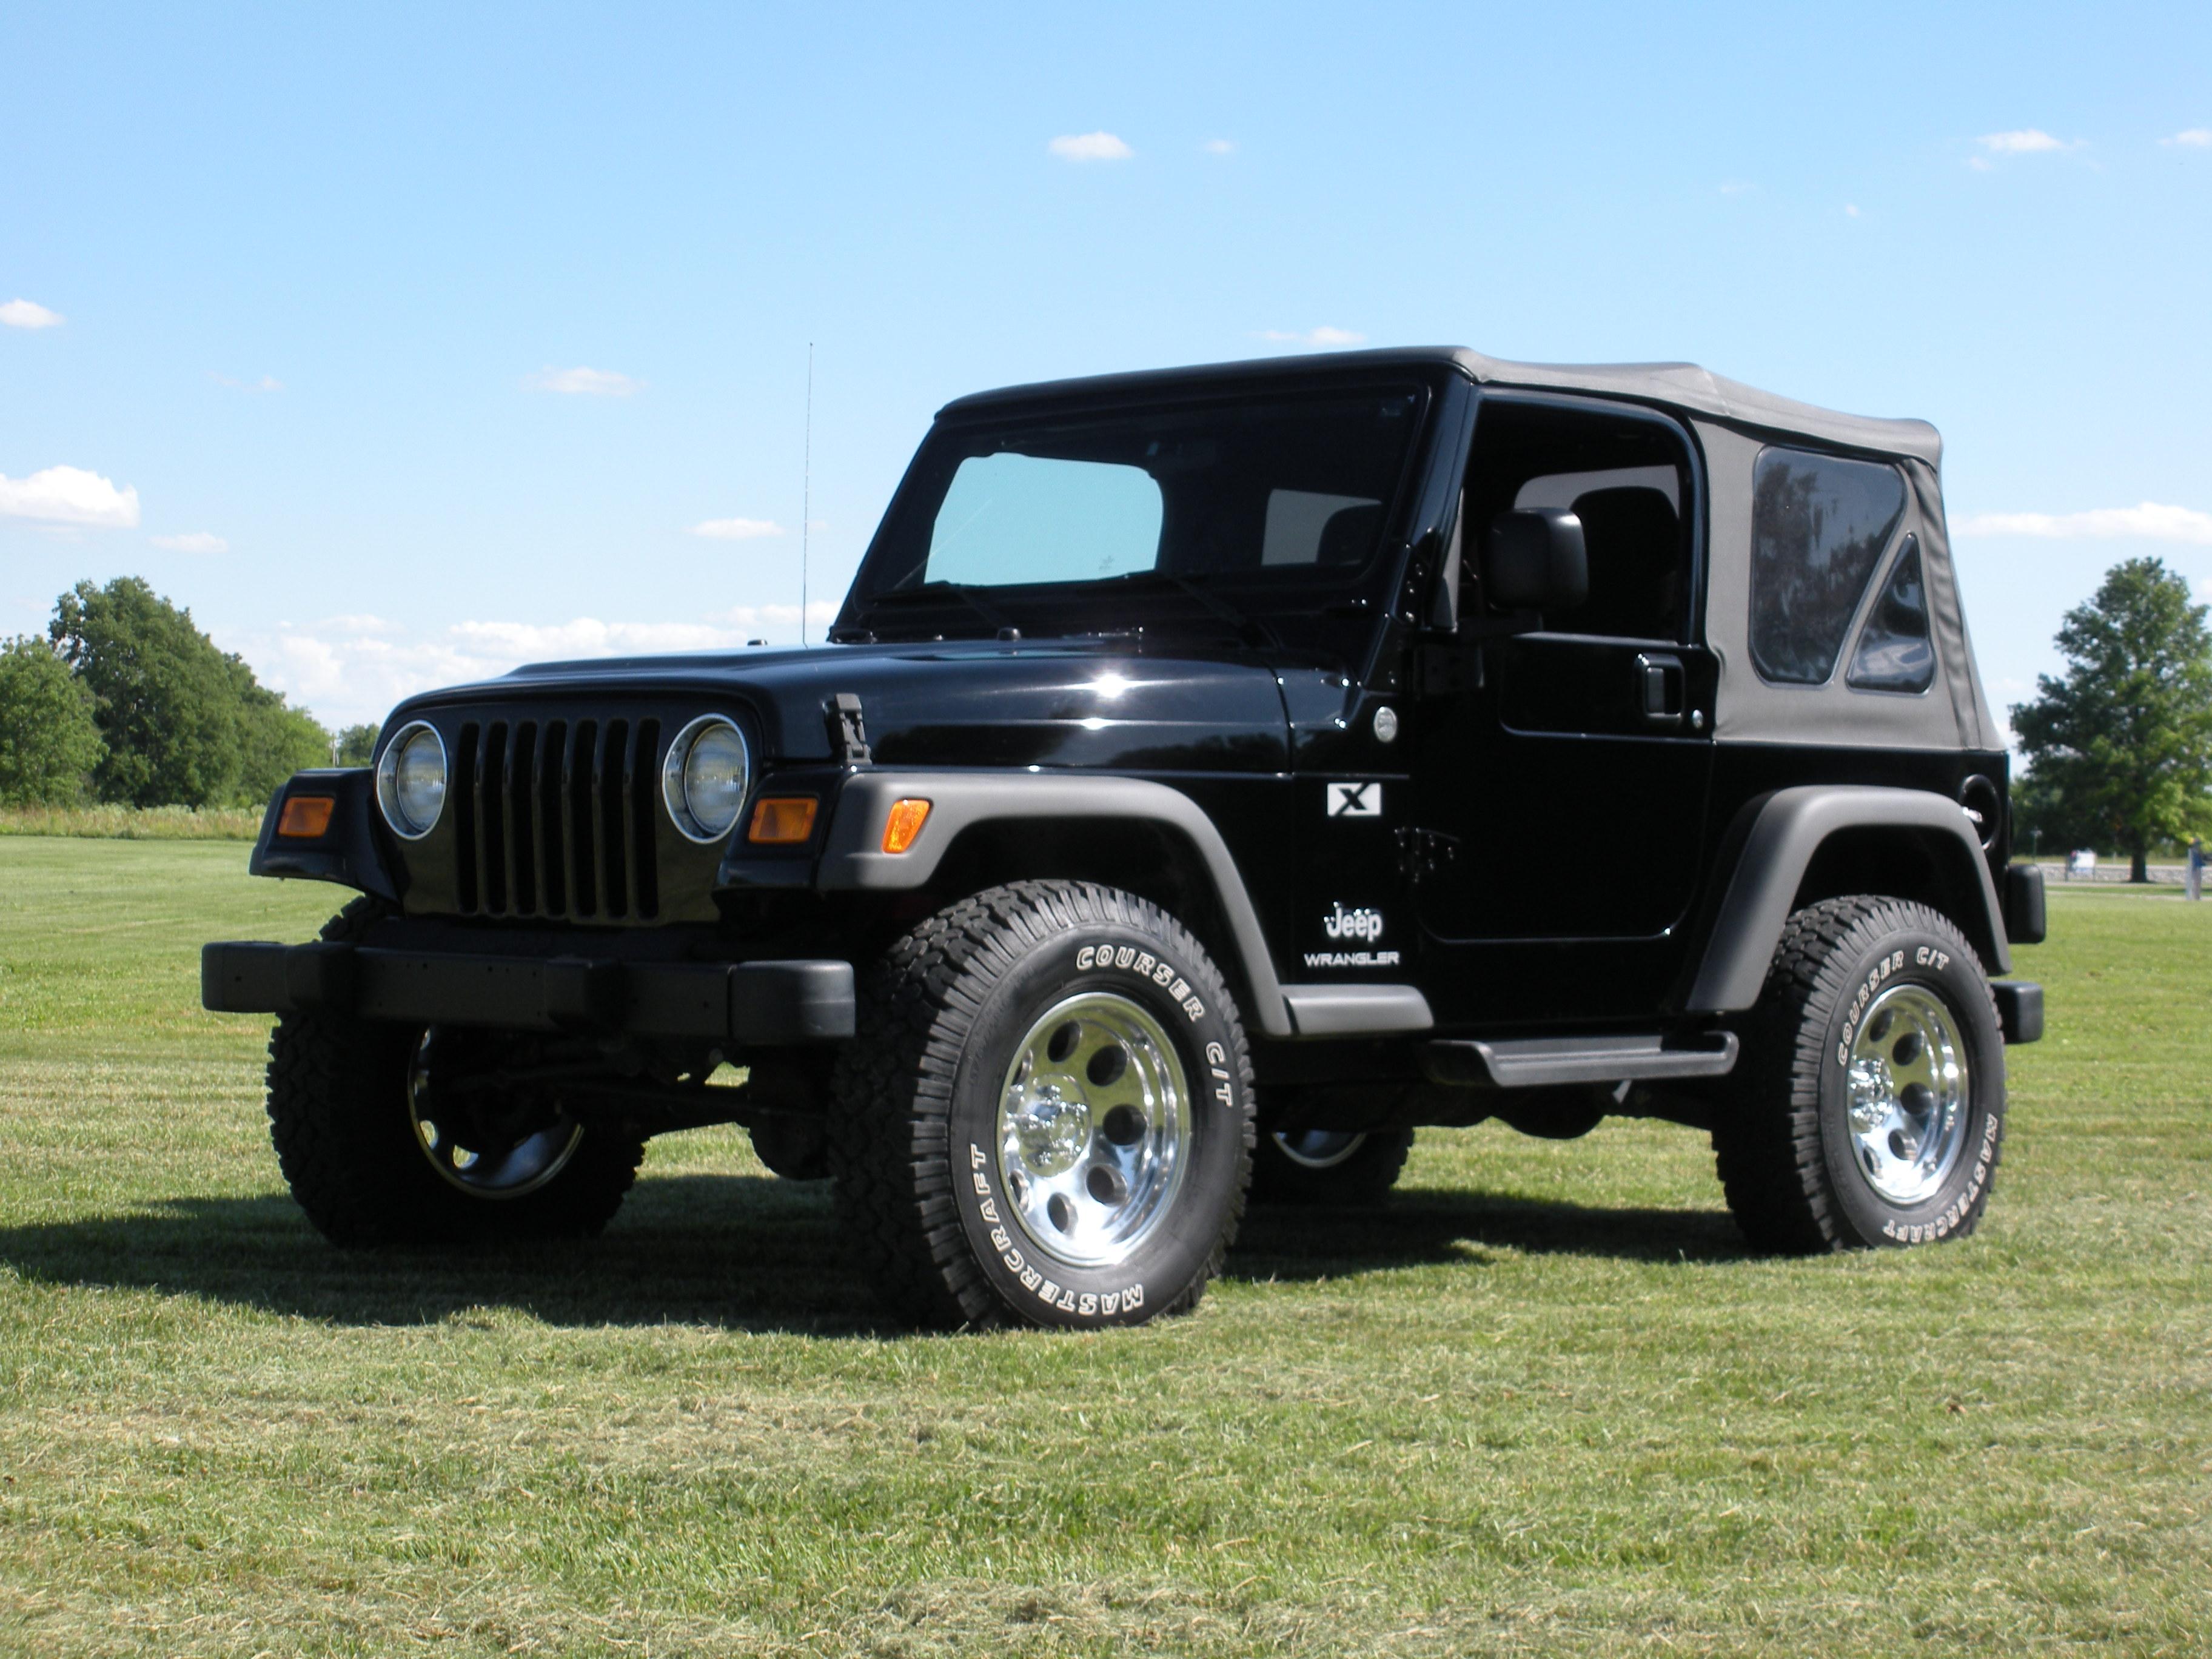 2005 Jeep Wrangler #20 Jeep Wrangler #20